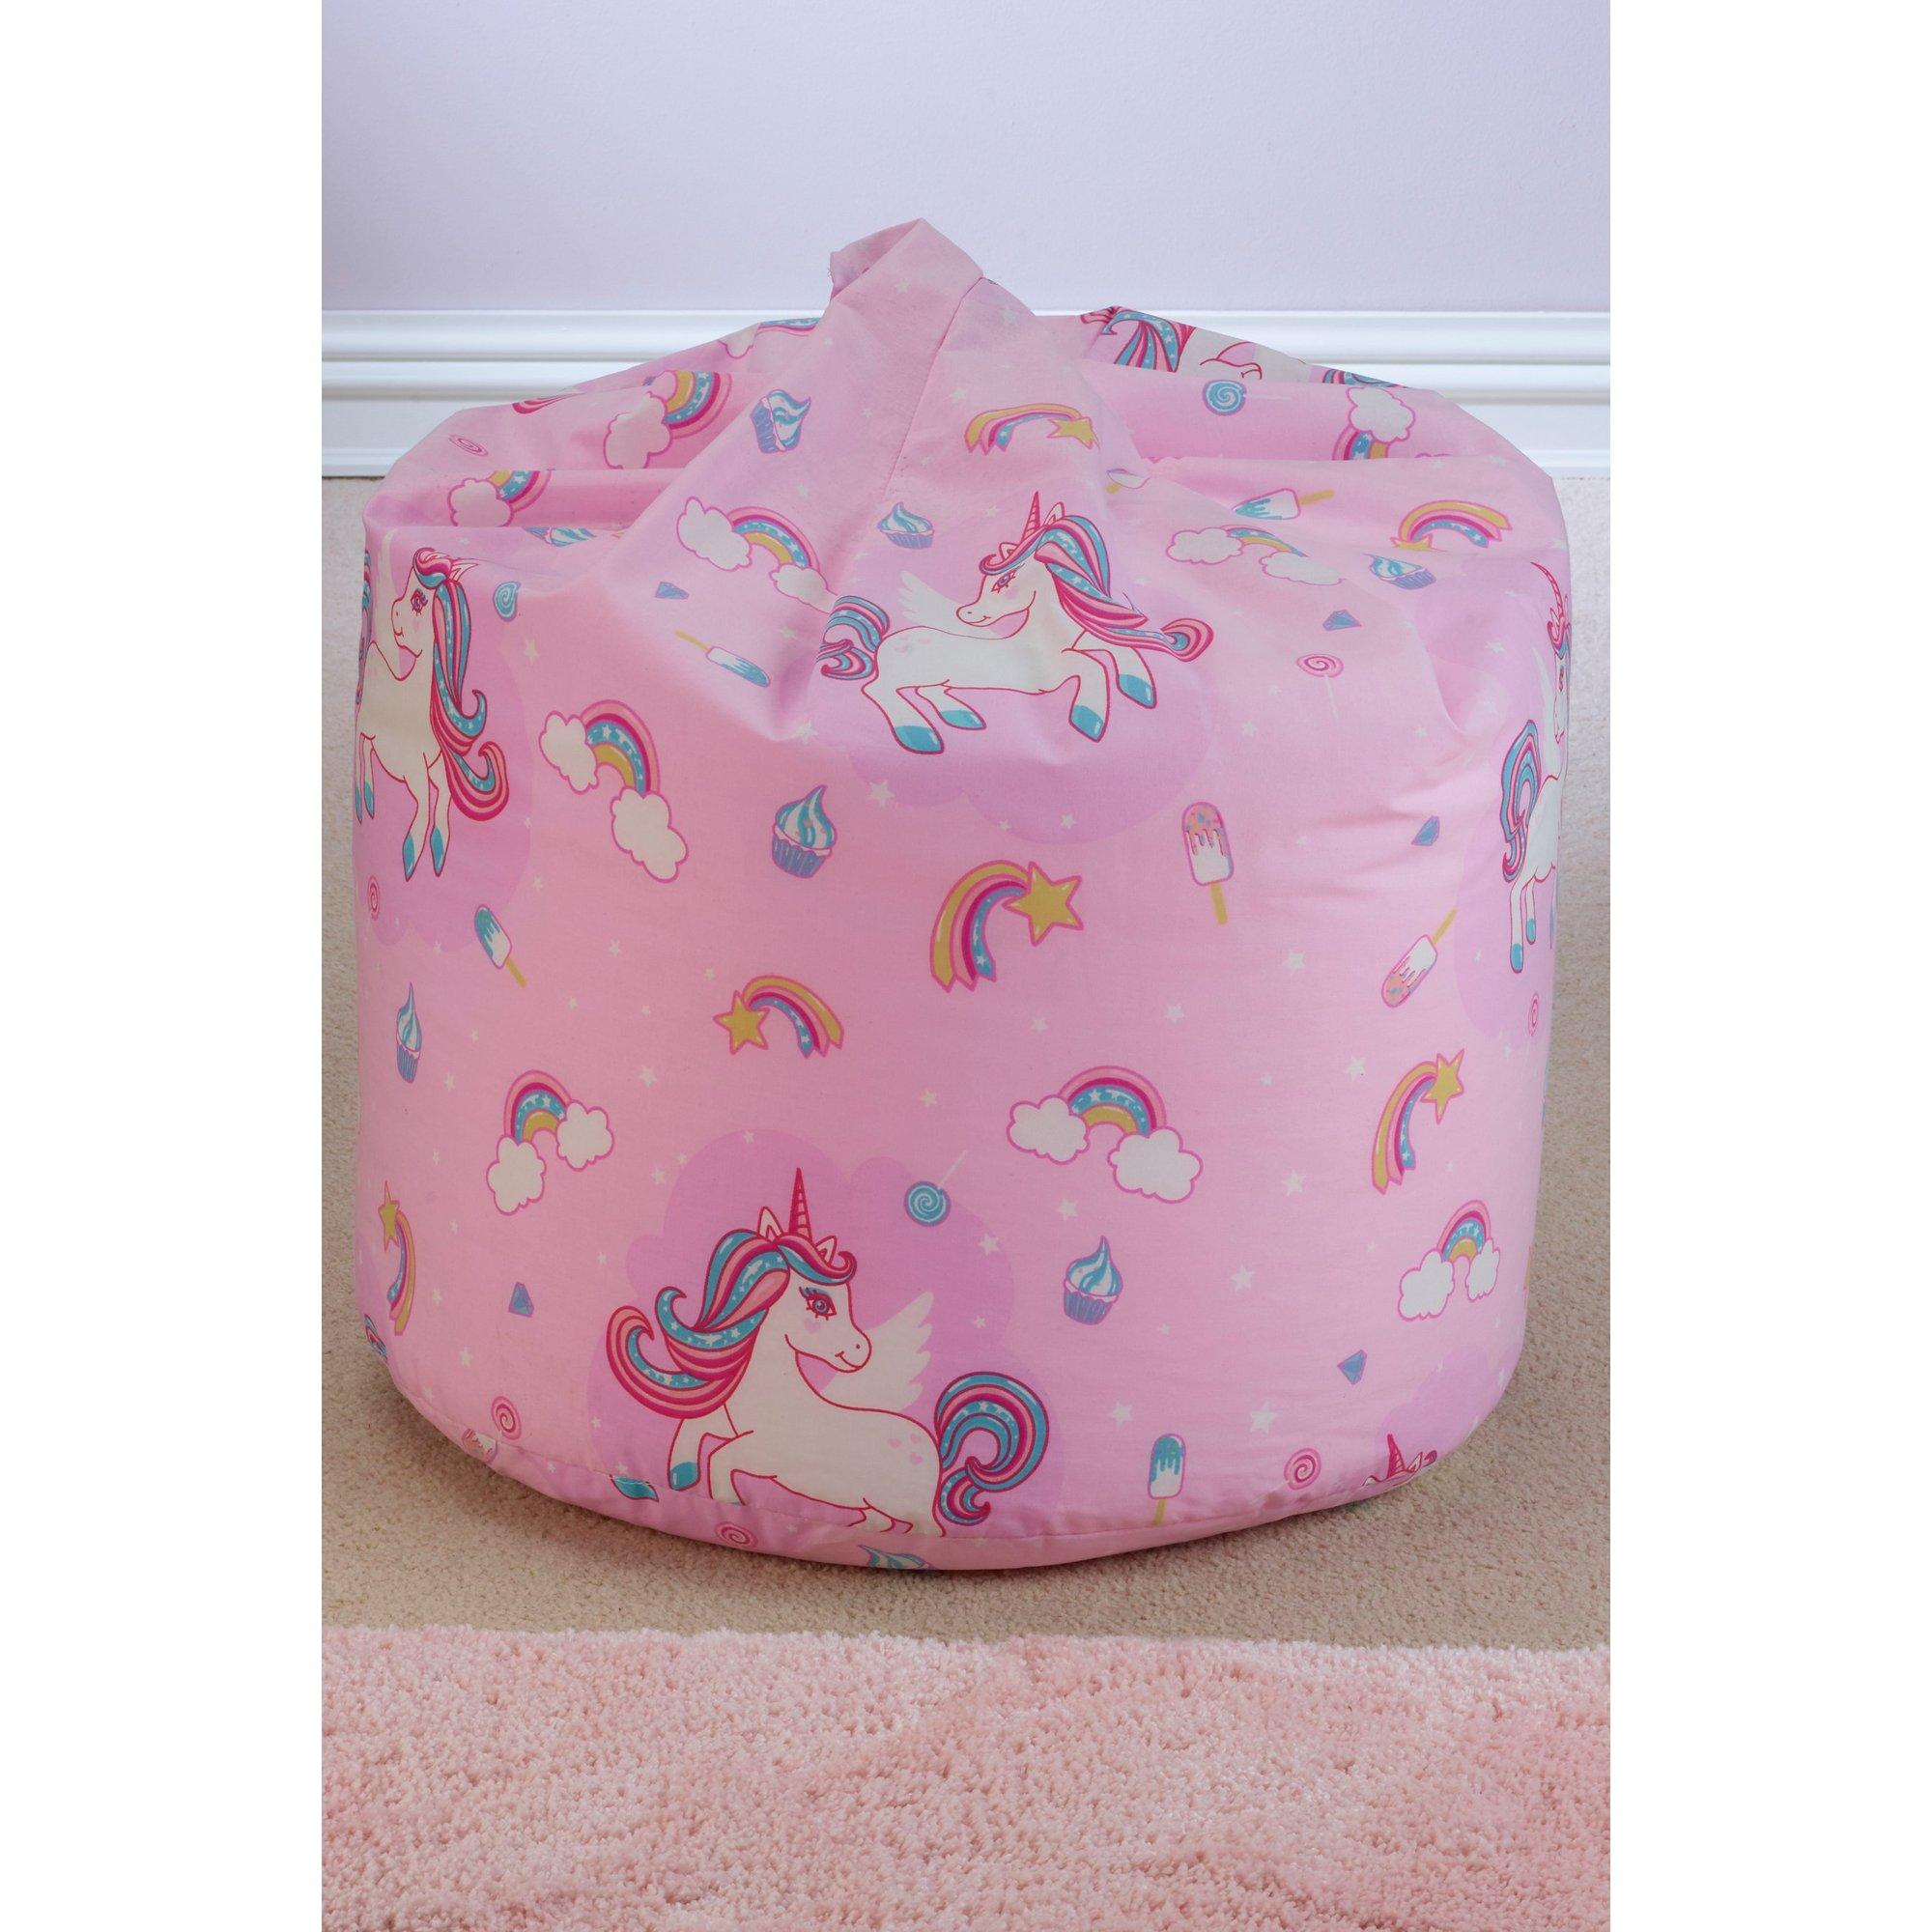 Image of Kids Unicorn Bean Bag